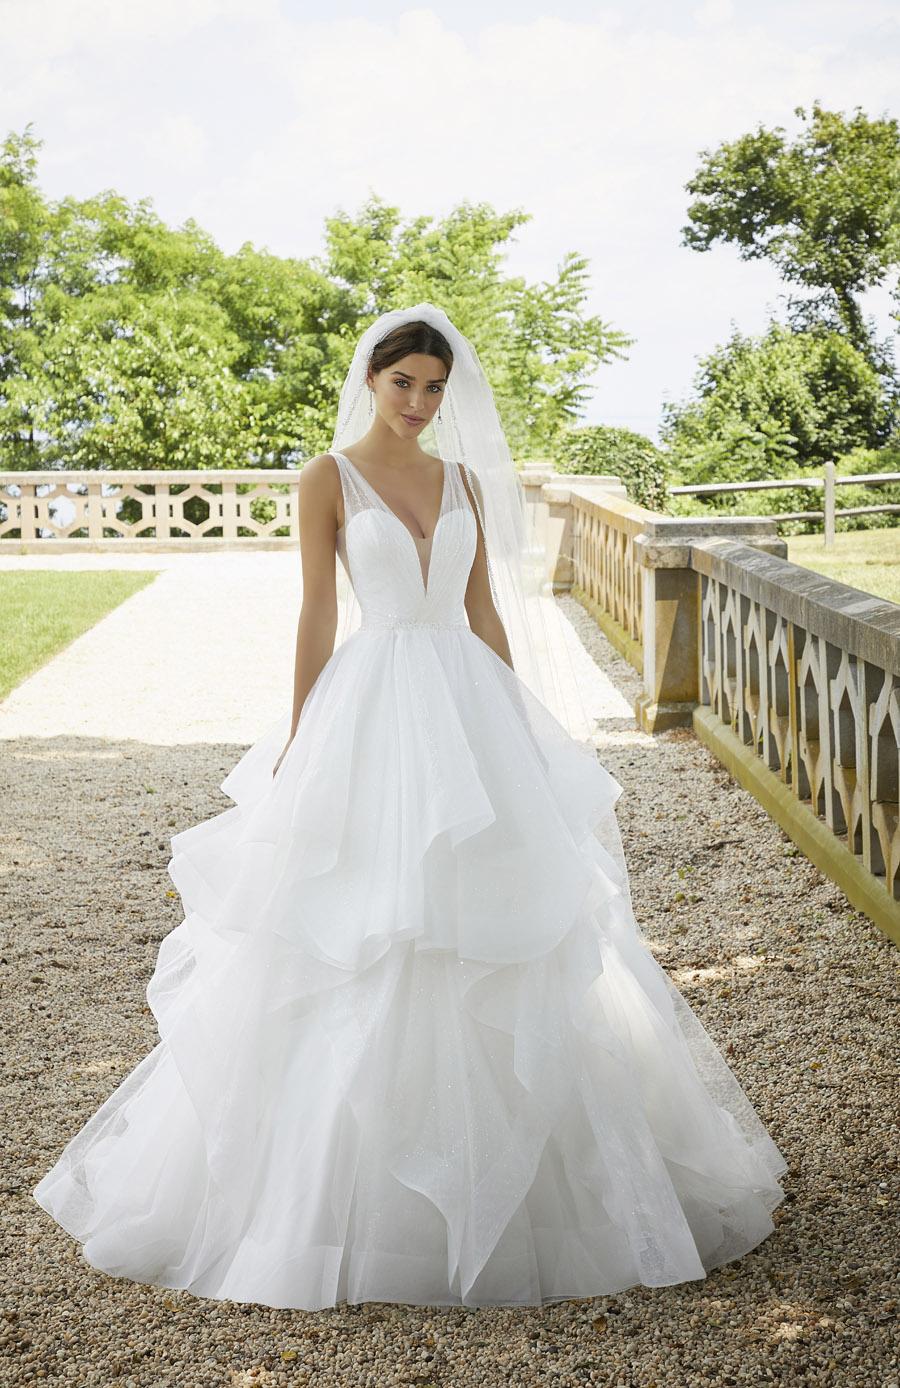 Wedding veils advice from TDR Bridal West Midlands